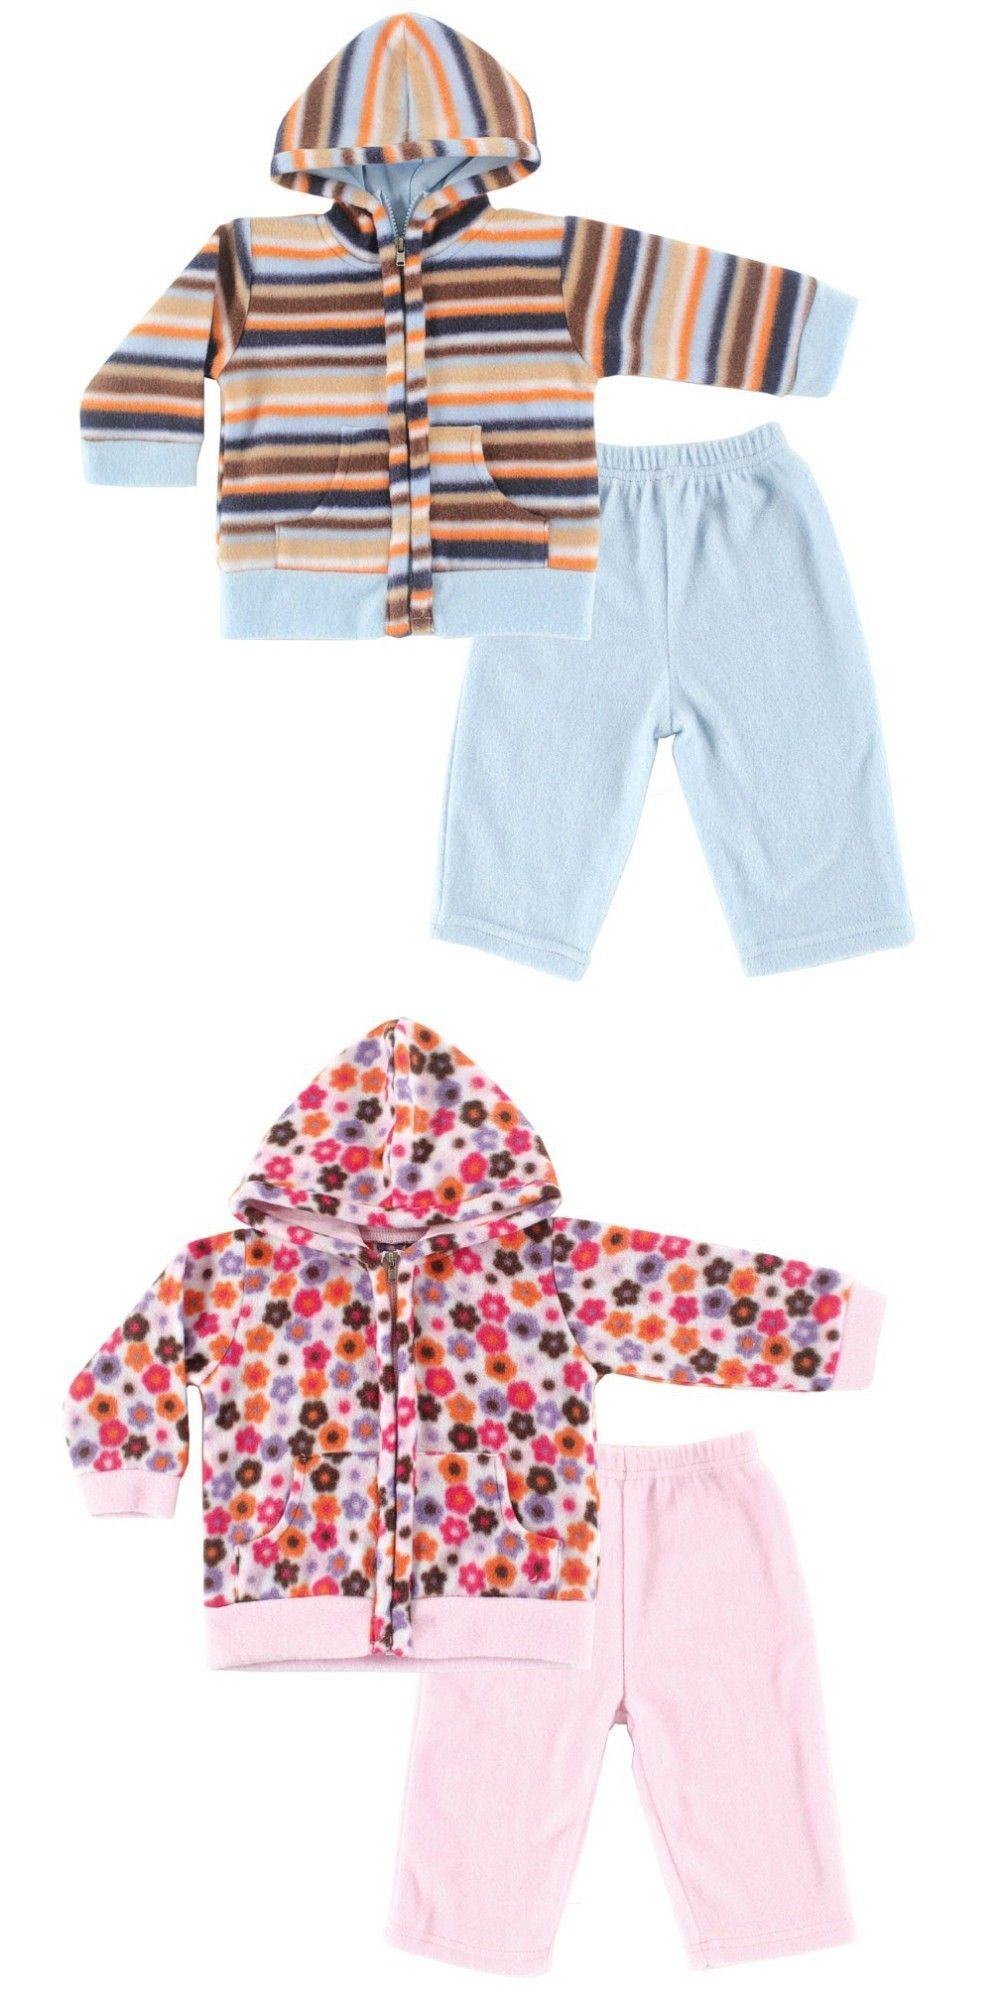 Hudson Baby Boys Girls Super Soft Fleece Long Sleeve Baby Clothing